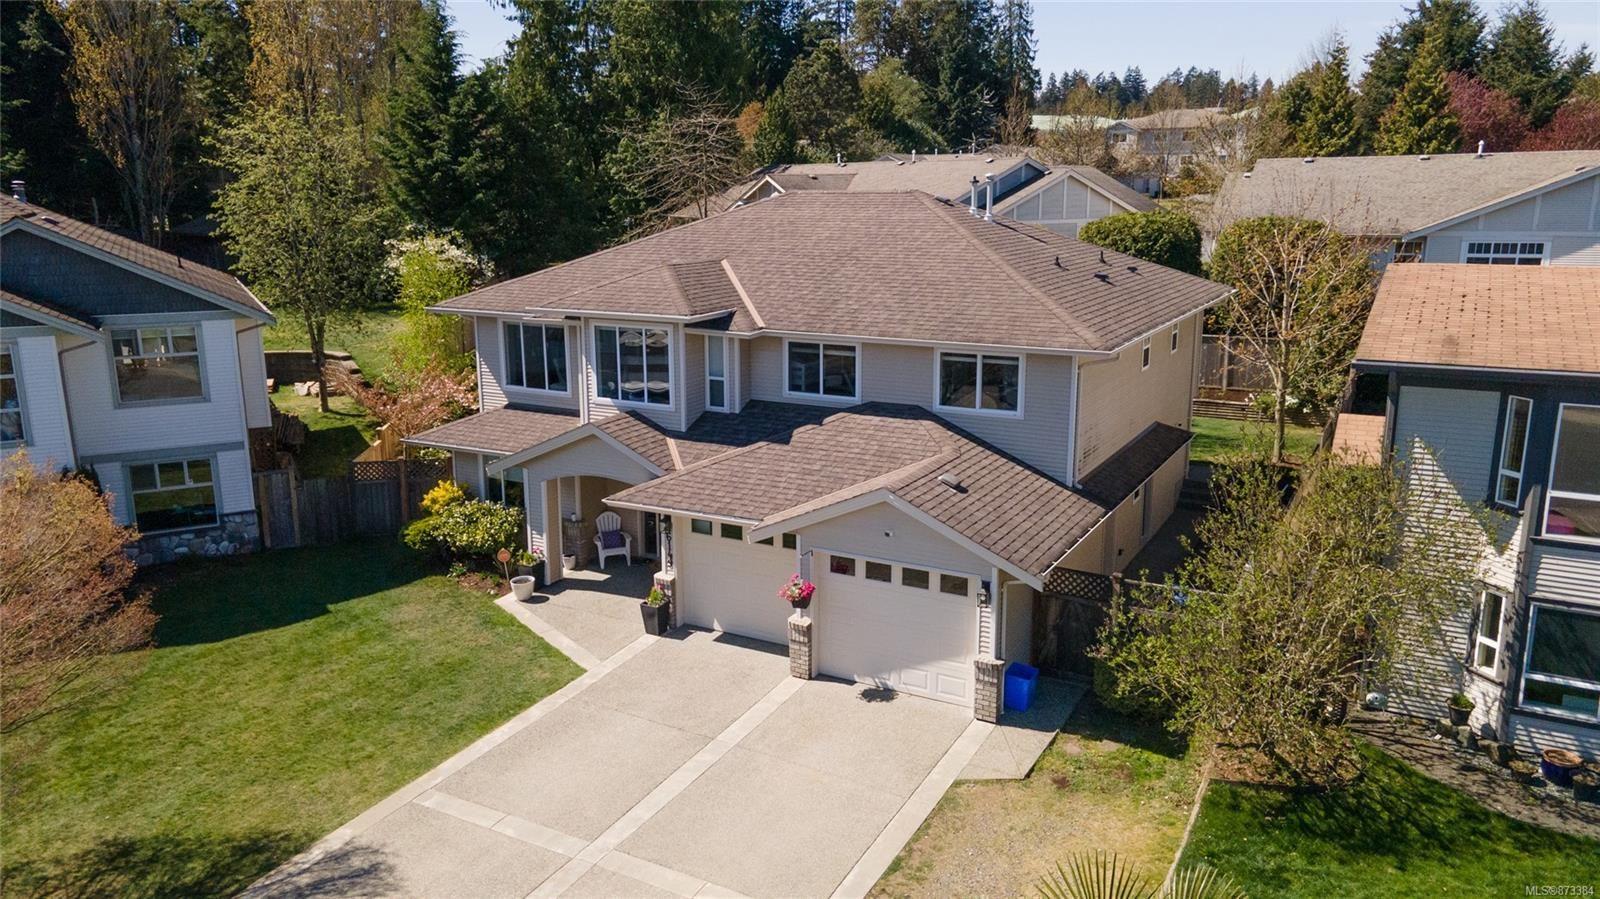 Main Photo: 6149 Somerside Pl in : Na North Nanaimo House for sale (Nanaimo)  : MLS®# 873384